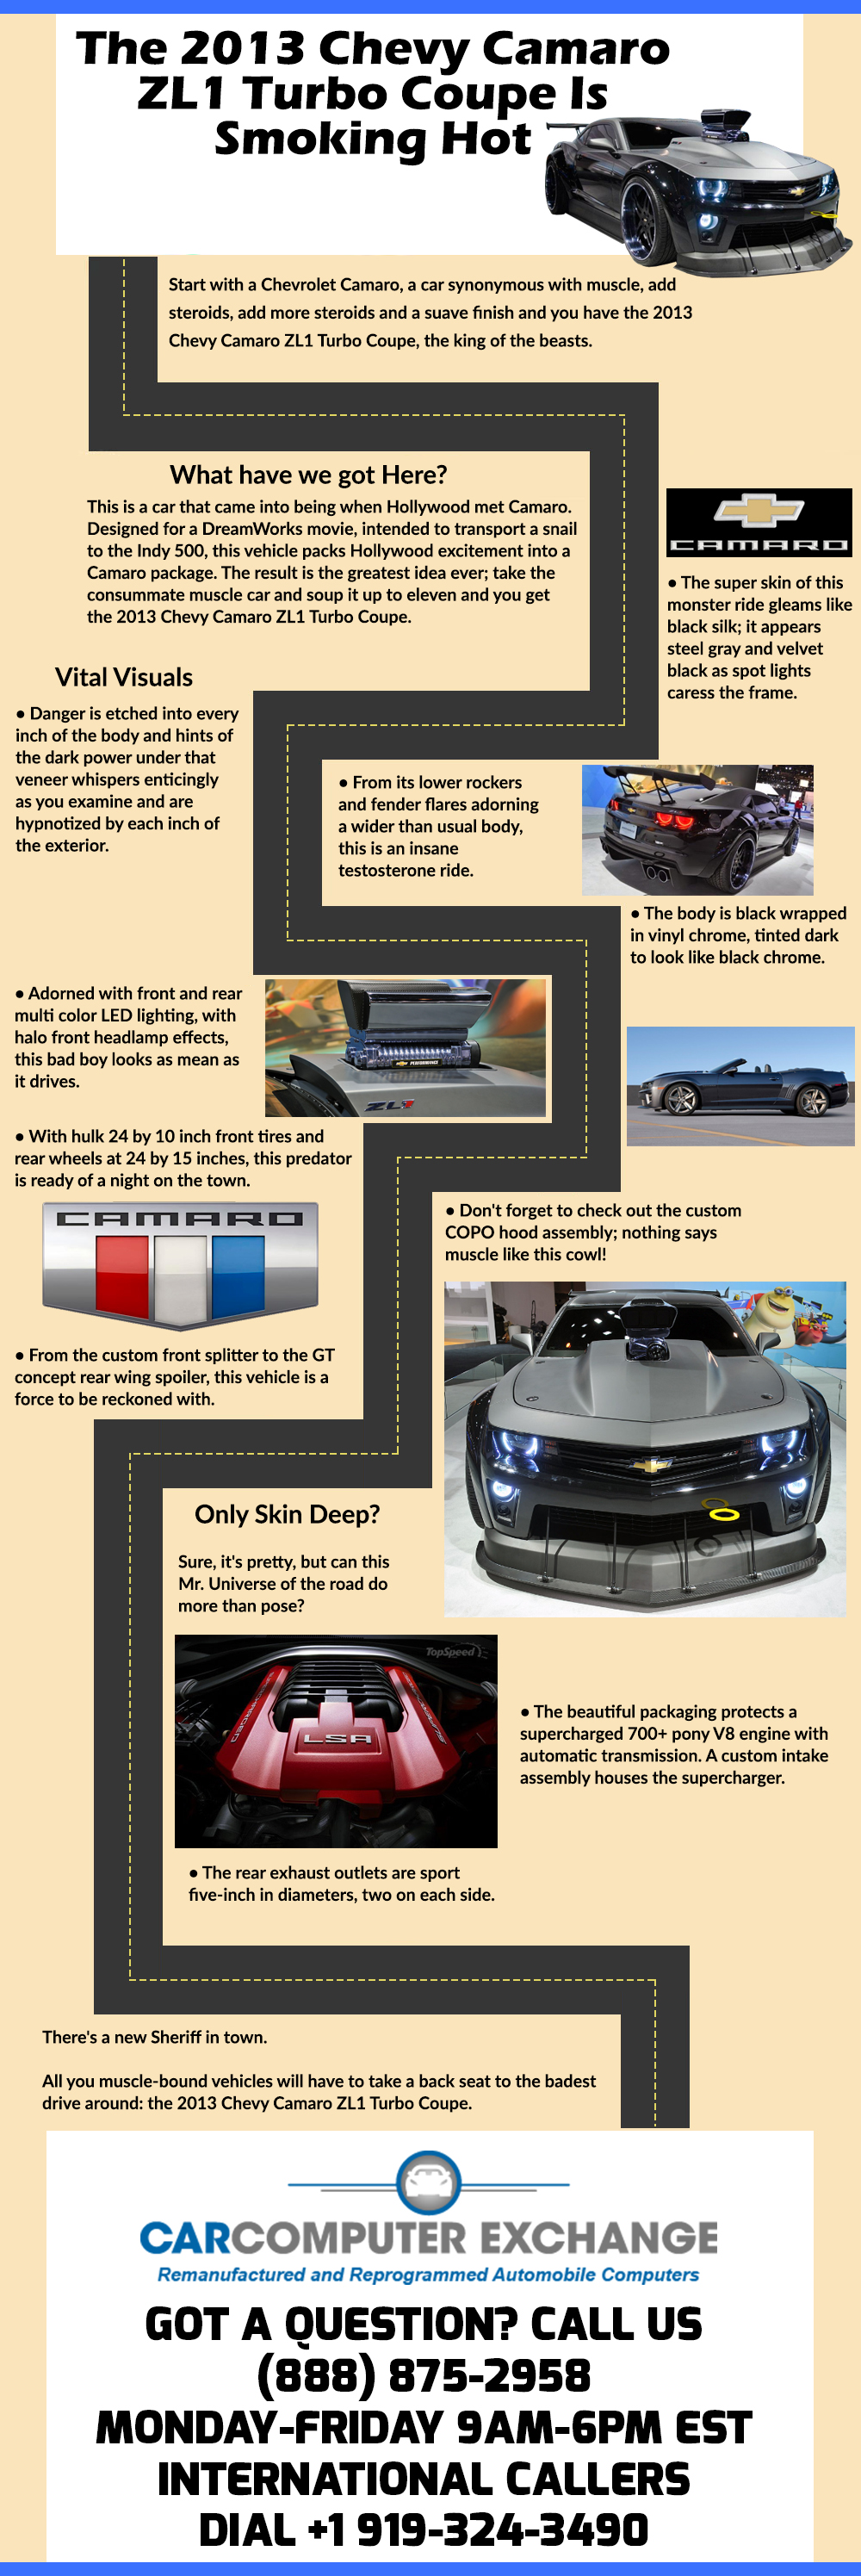 Pin On Fun Infographics